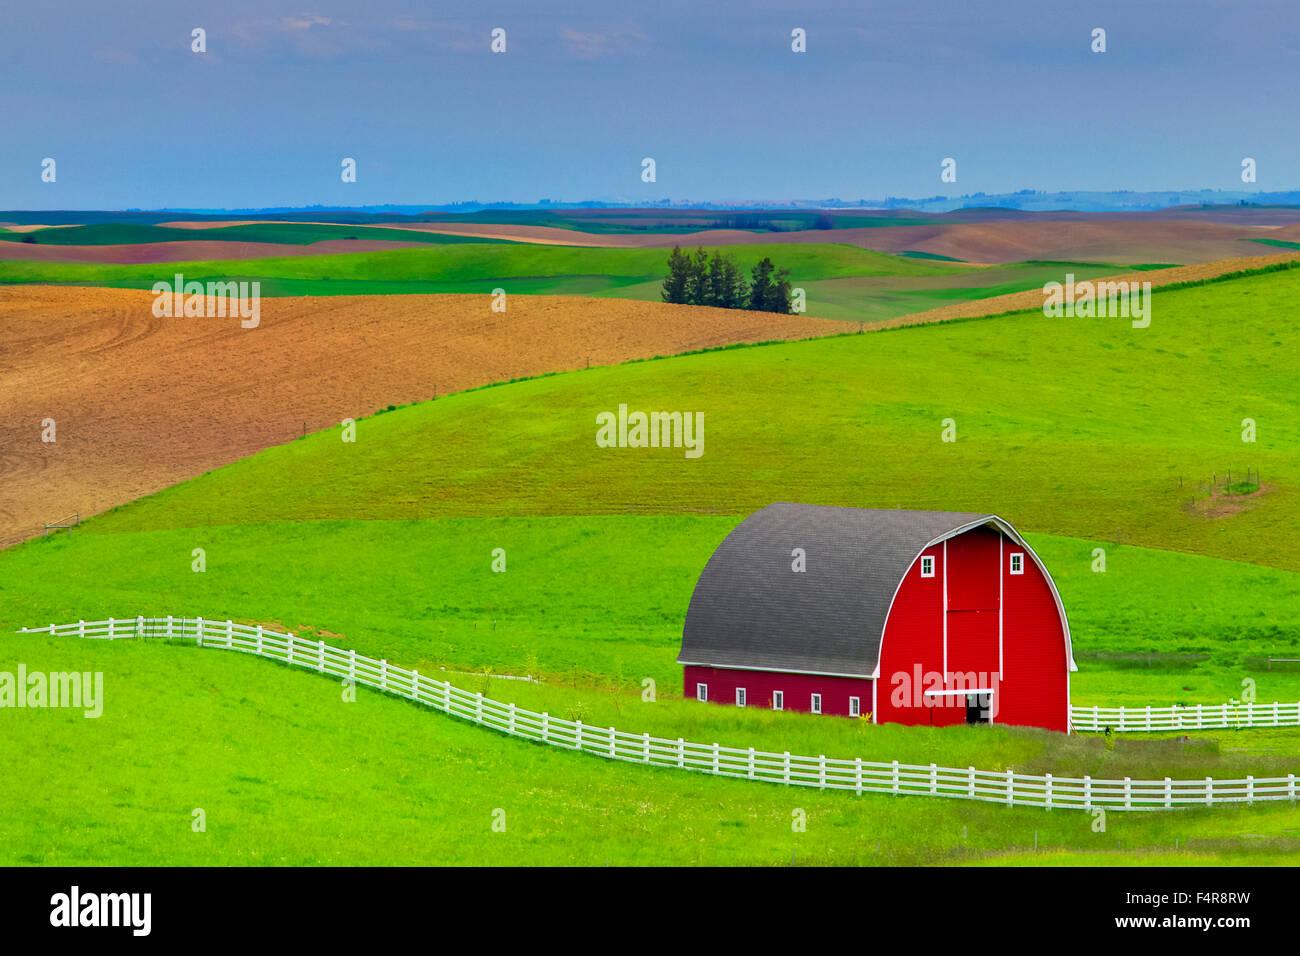 USA, United States, America, Pacific Northwest, Washington, Washington State, Steptoe Butte, Palouse, fields, barn - Stock Image